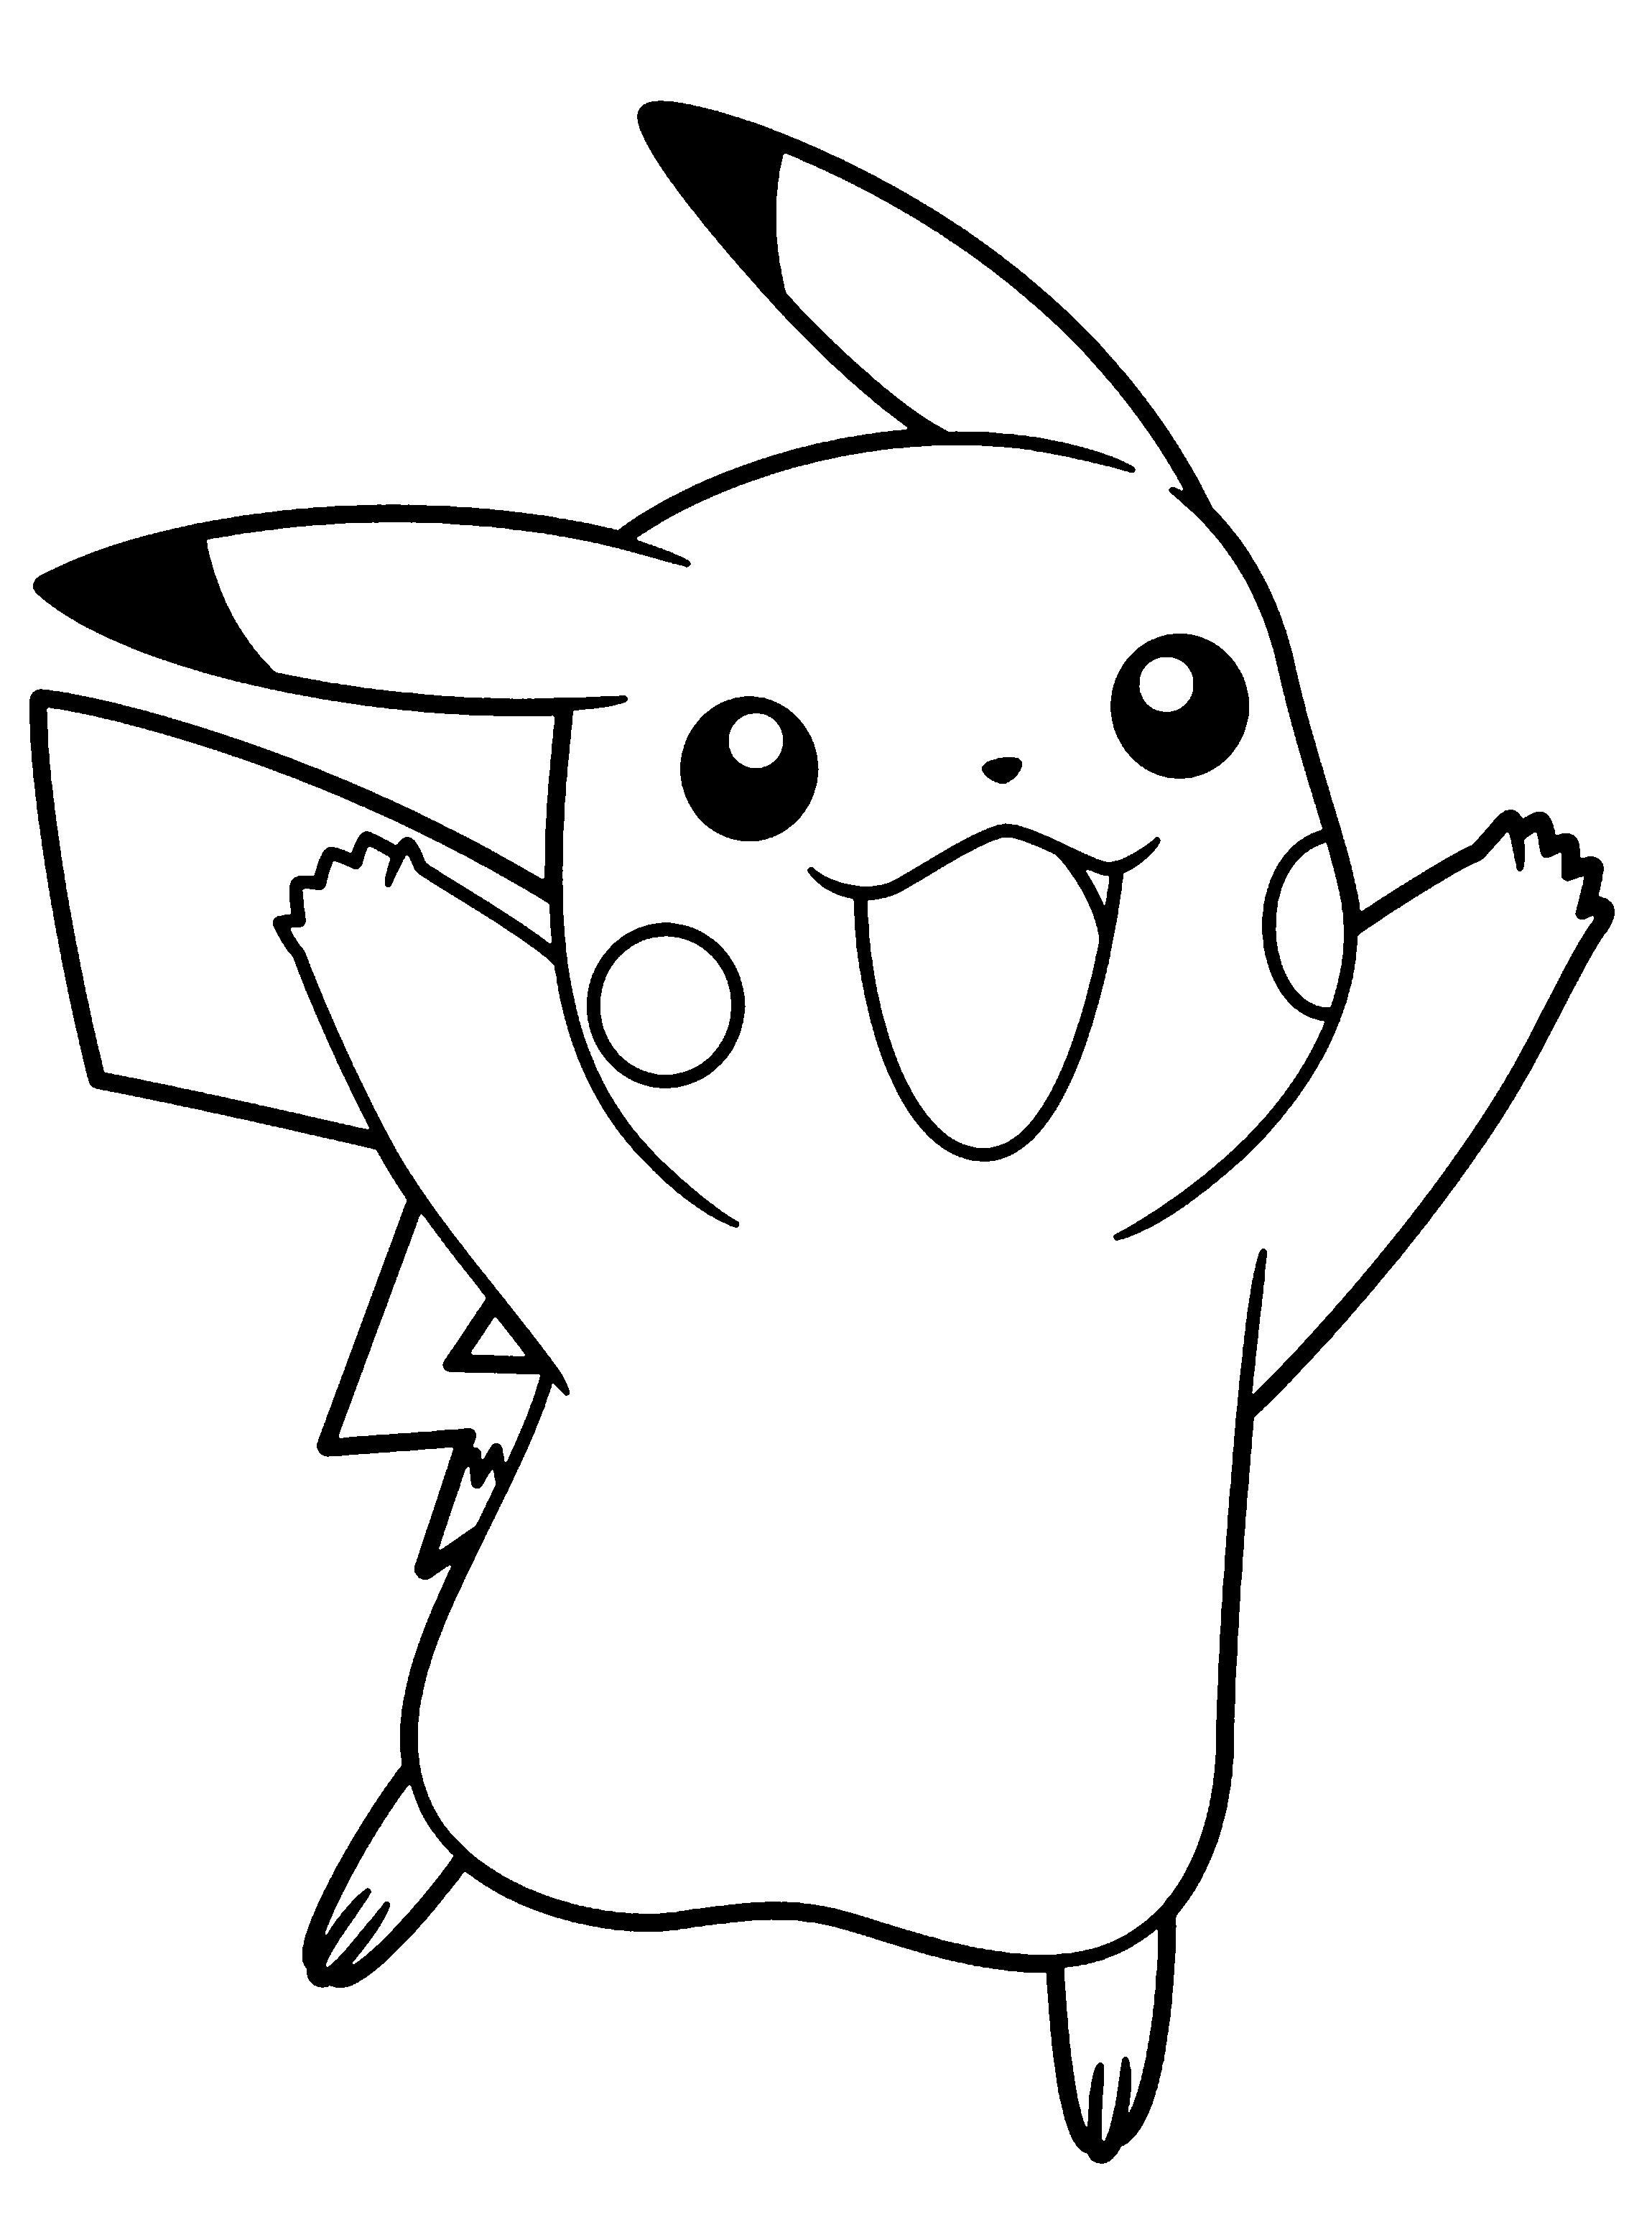 Kleurplaat Tv Series Kleurplaat Pokemon Black Animaatjes Nl